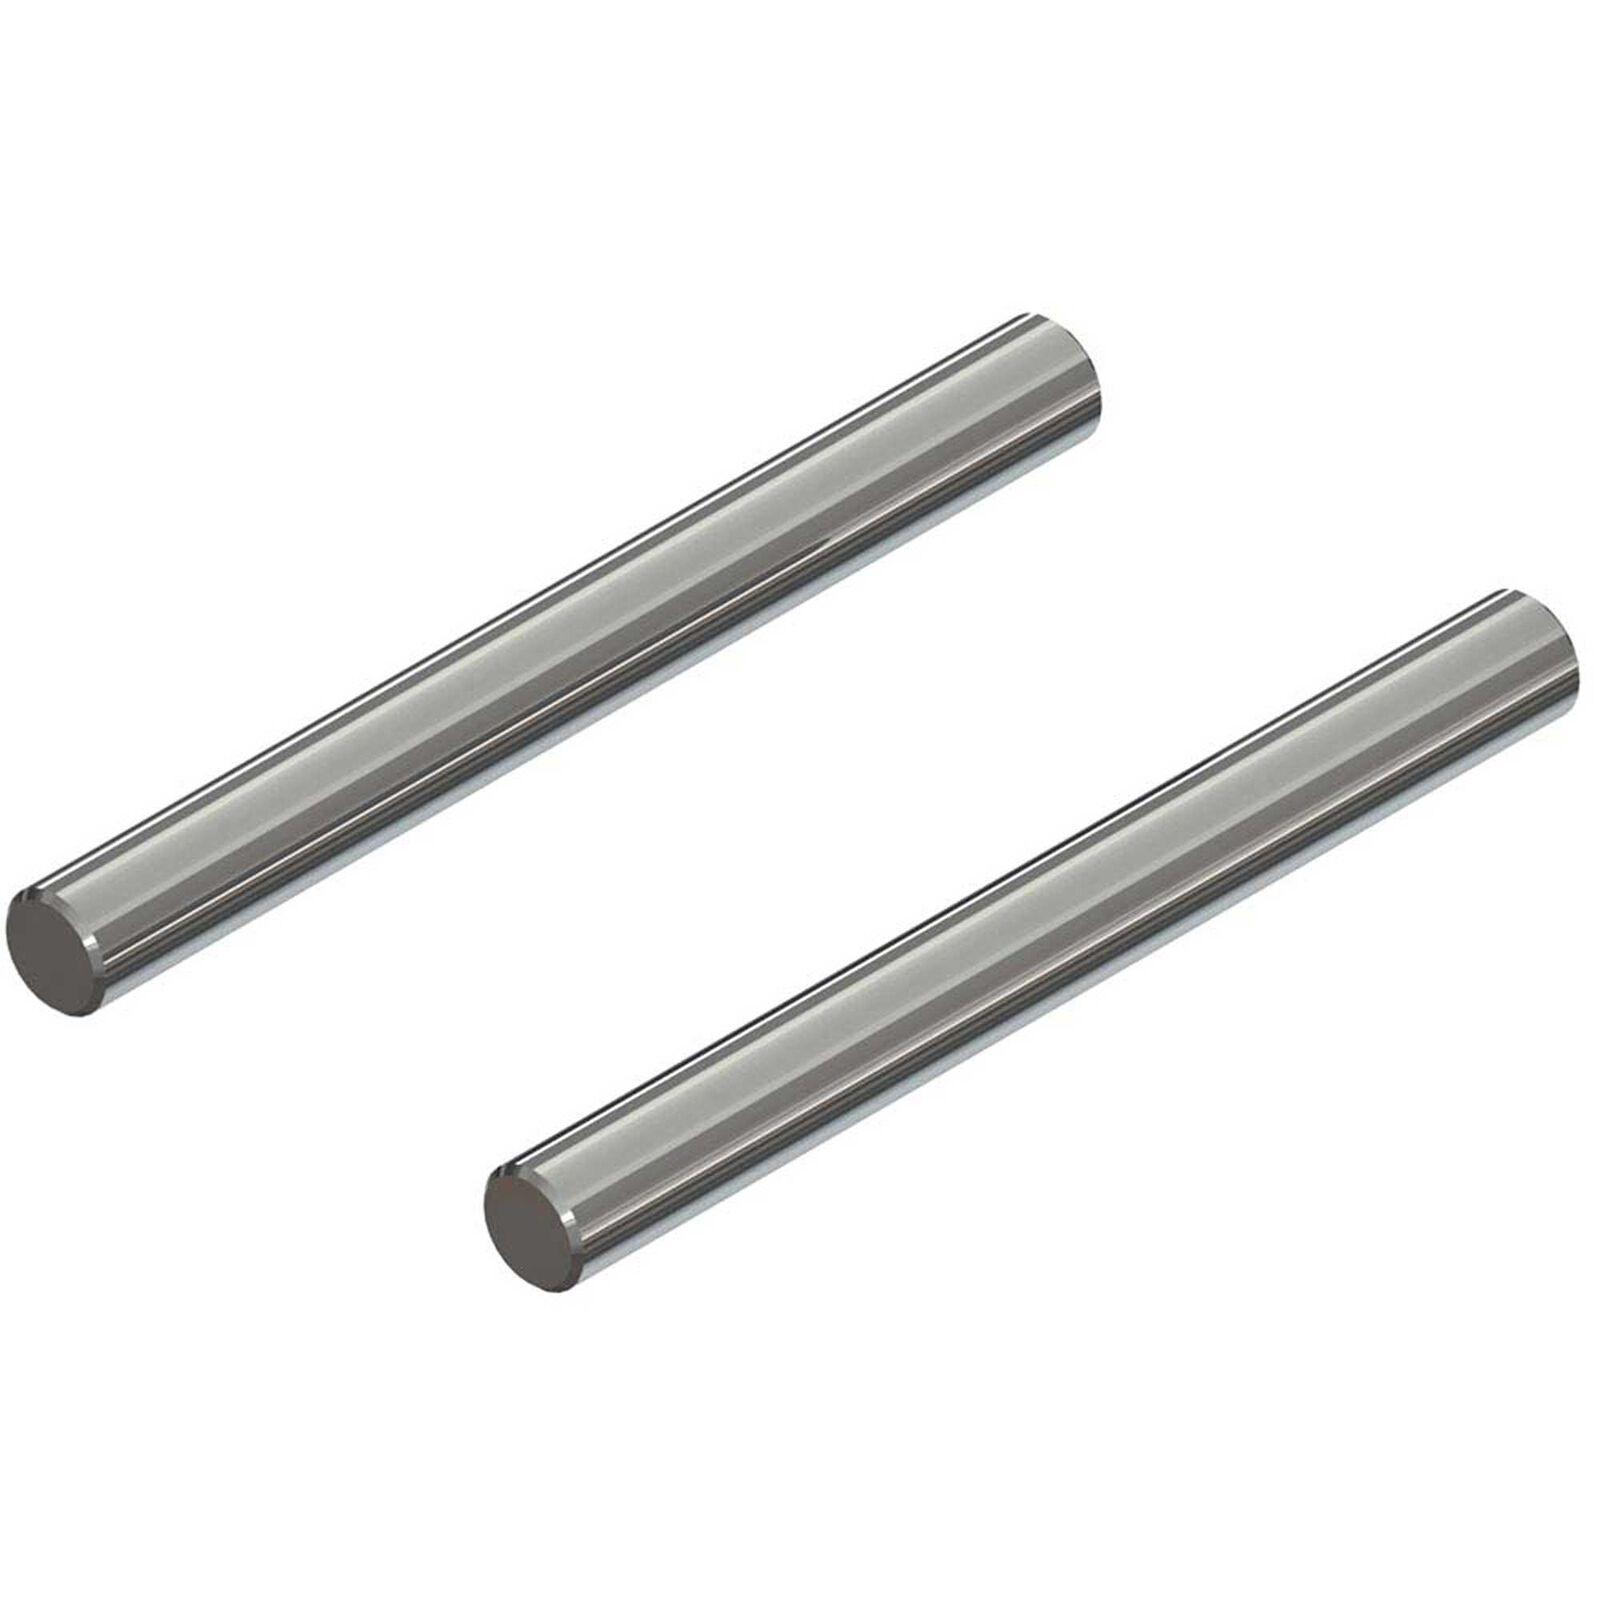 Hinge Pin 4x40mm (2): 4x4